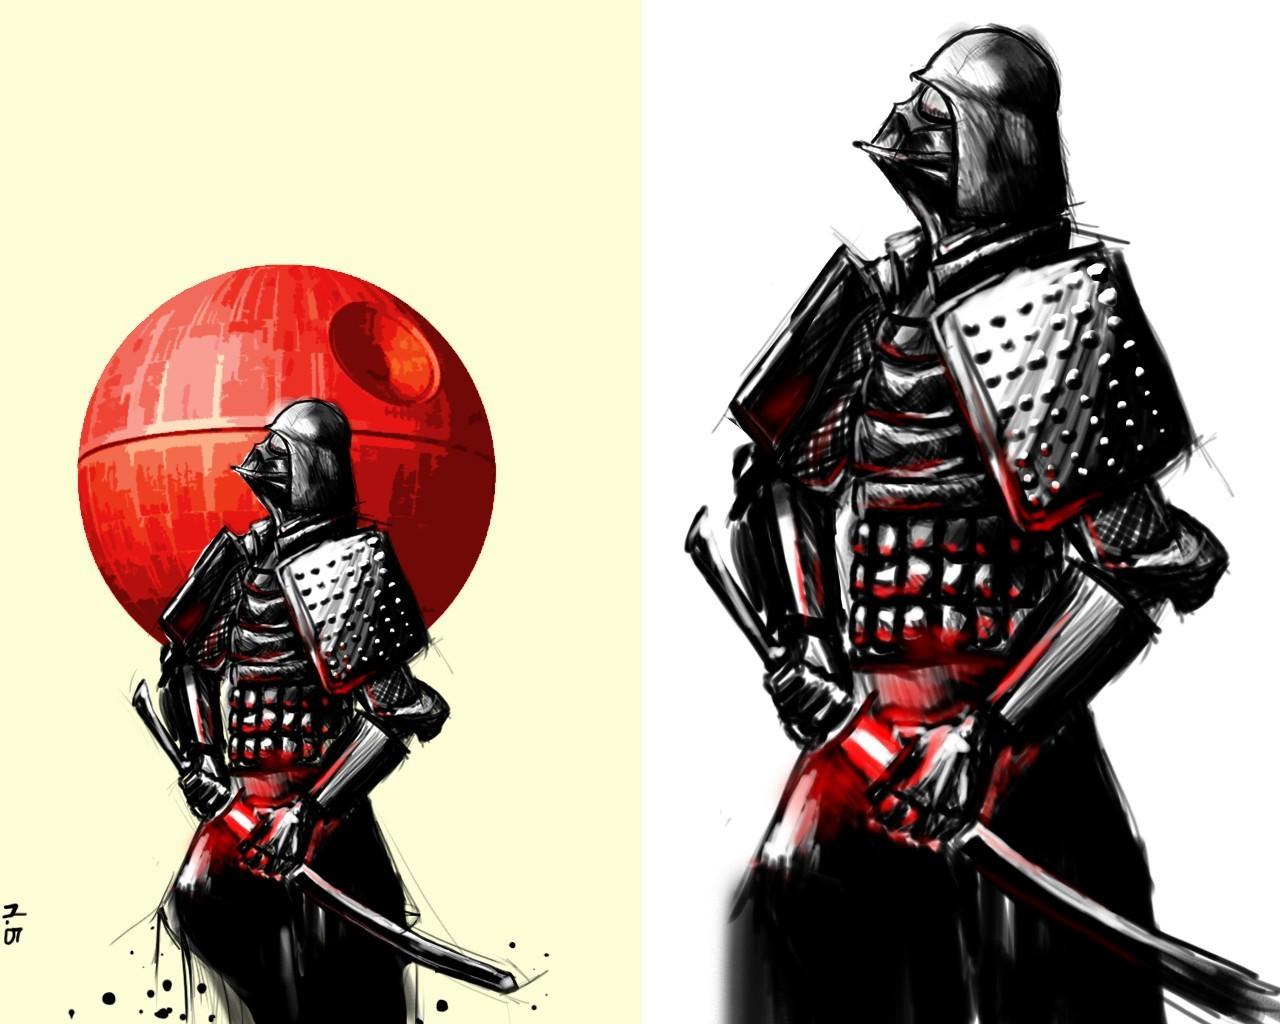 Drawn samurai hd wallpapers HD Wars Darth Mobile and